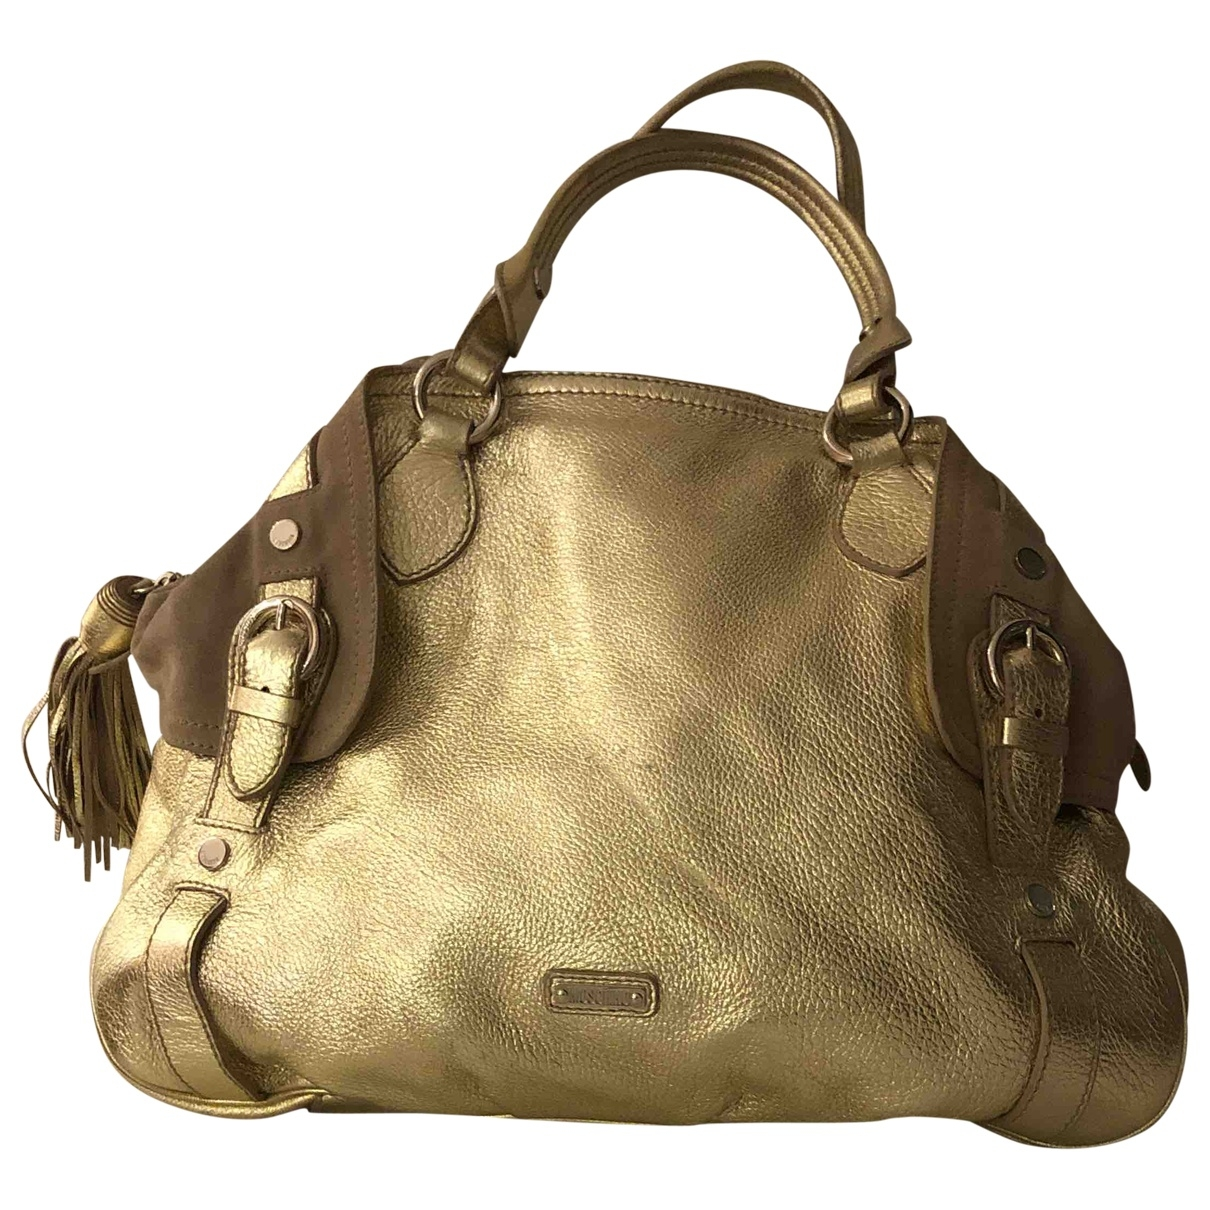 Moschino \N Gold Leather handbag for Women \N